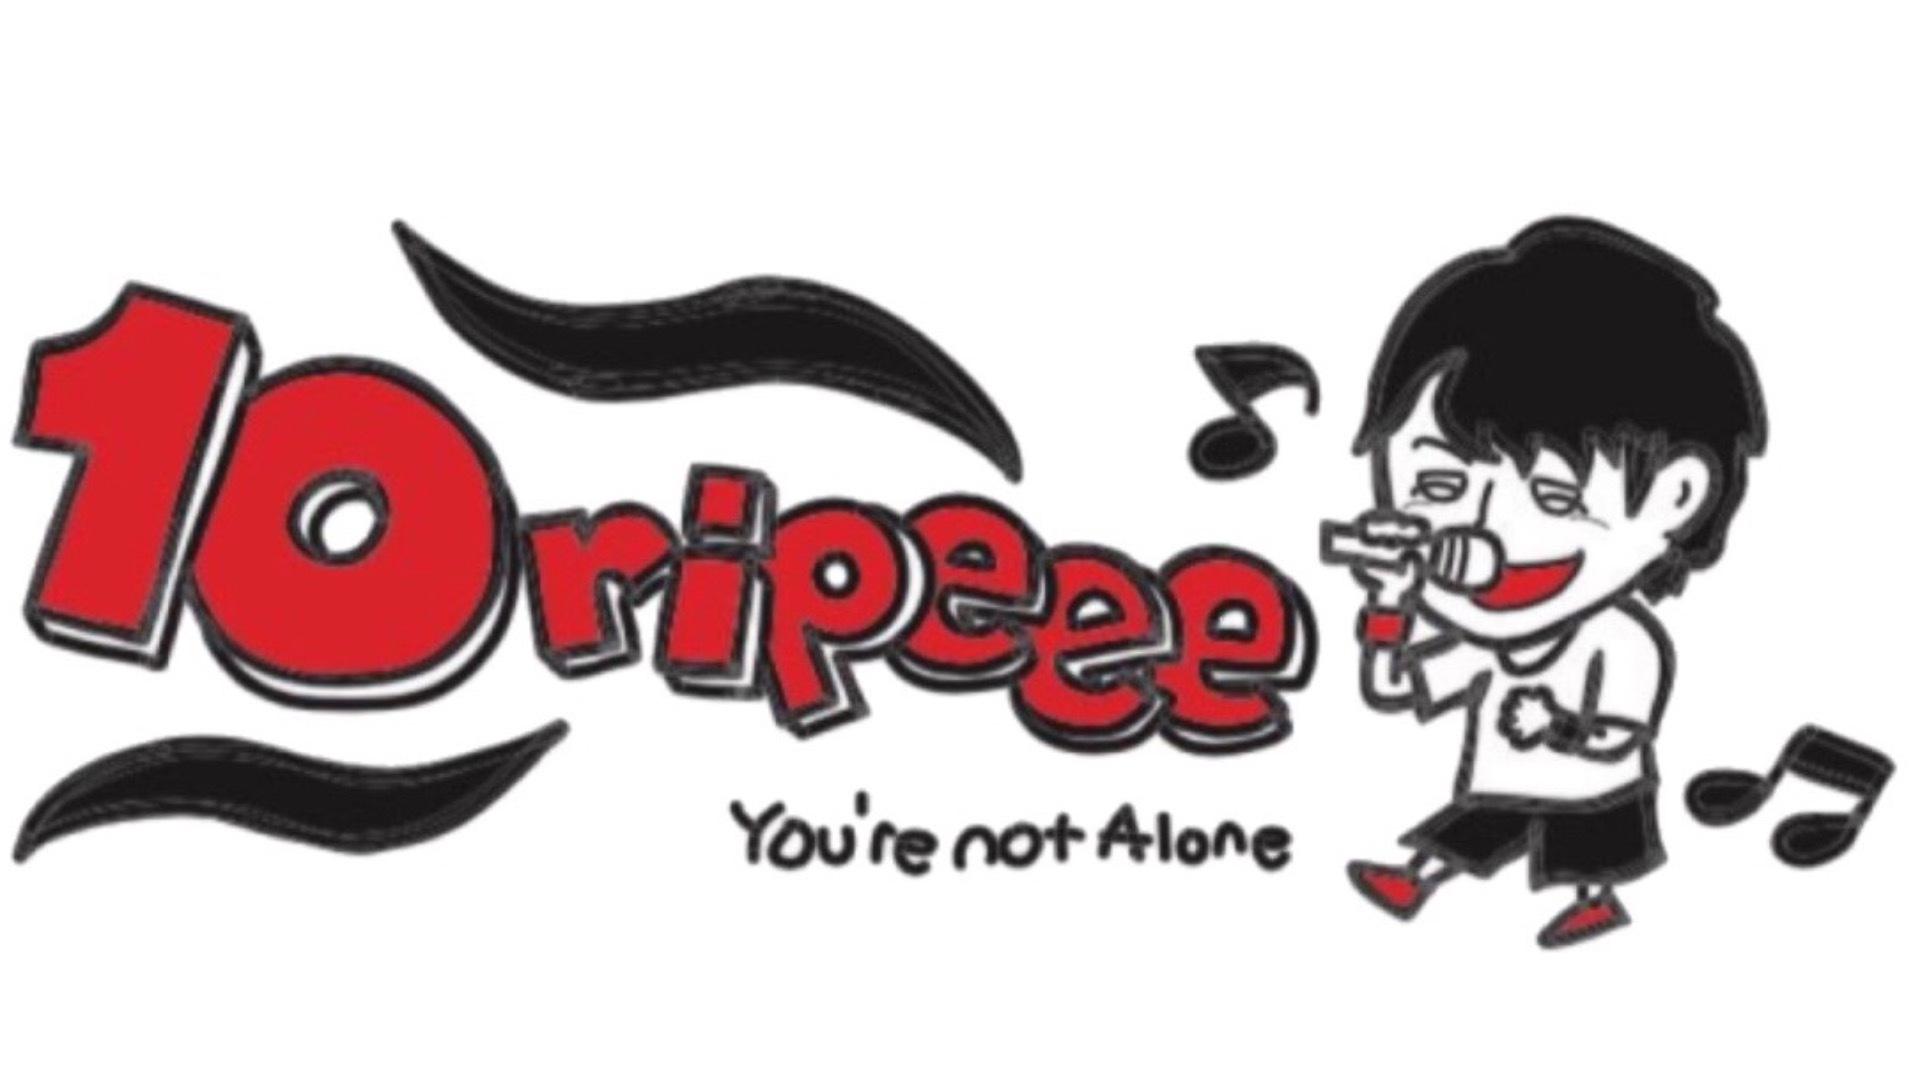 10ripeee rooter's school